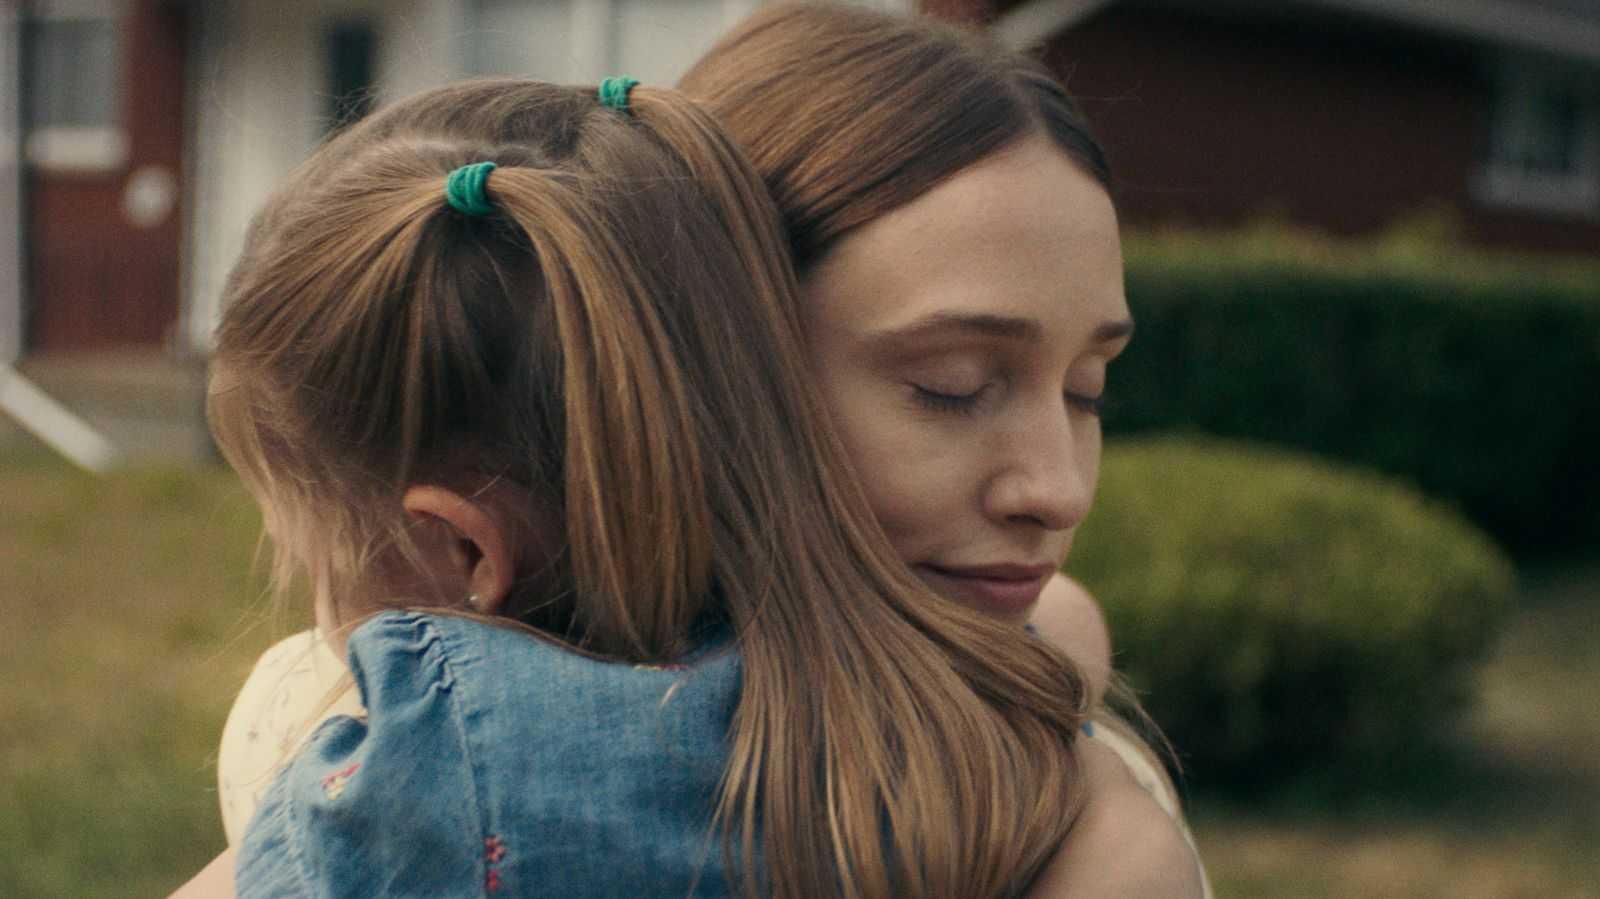 Like a House on Fire Summary & Analysis Ending 2021 Film